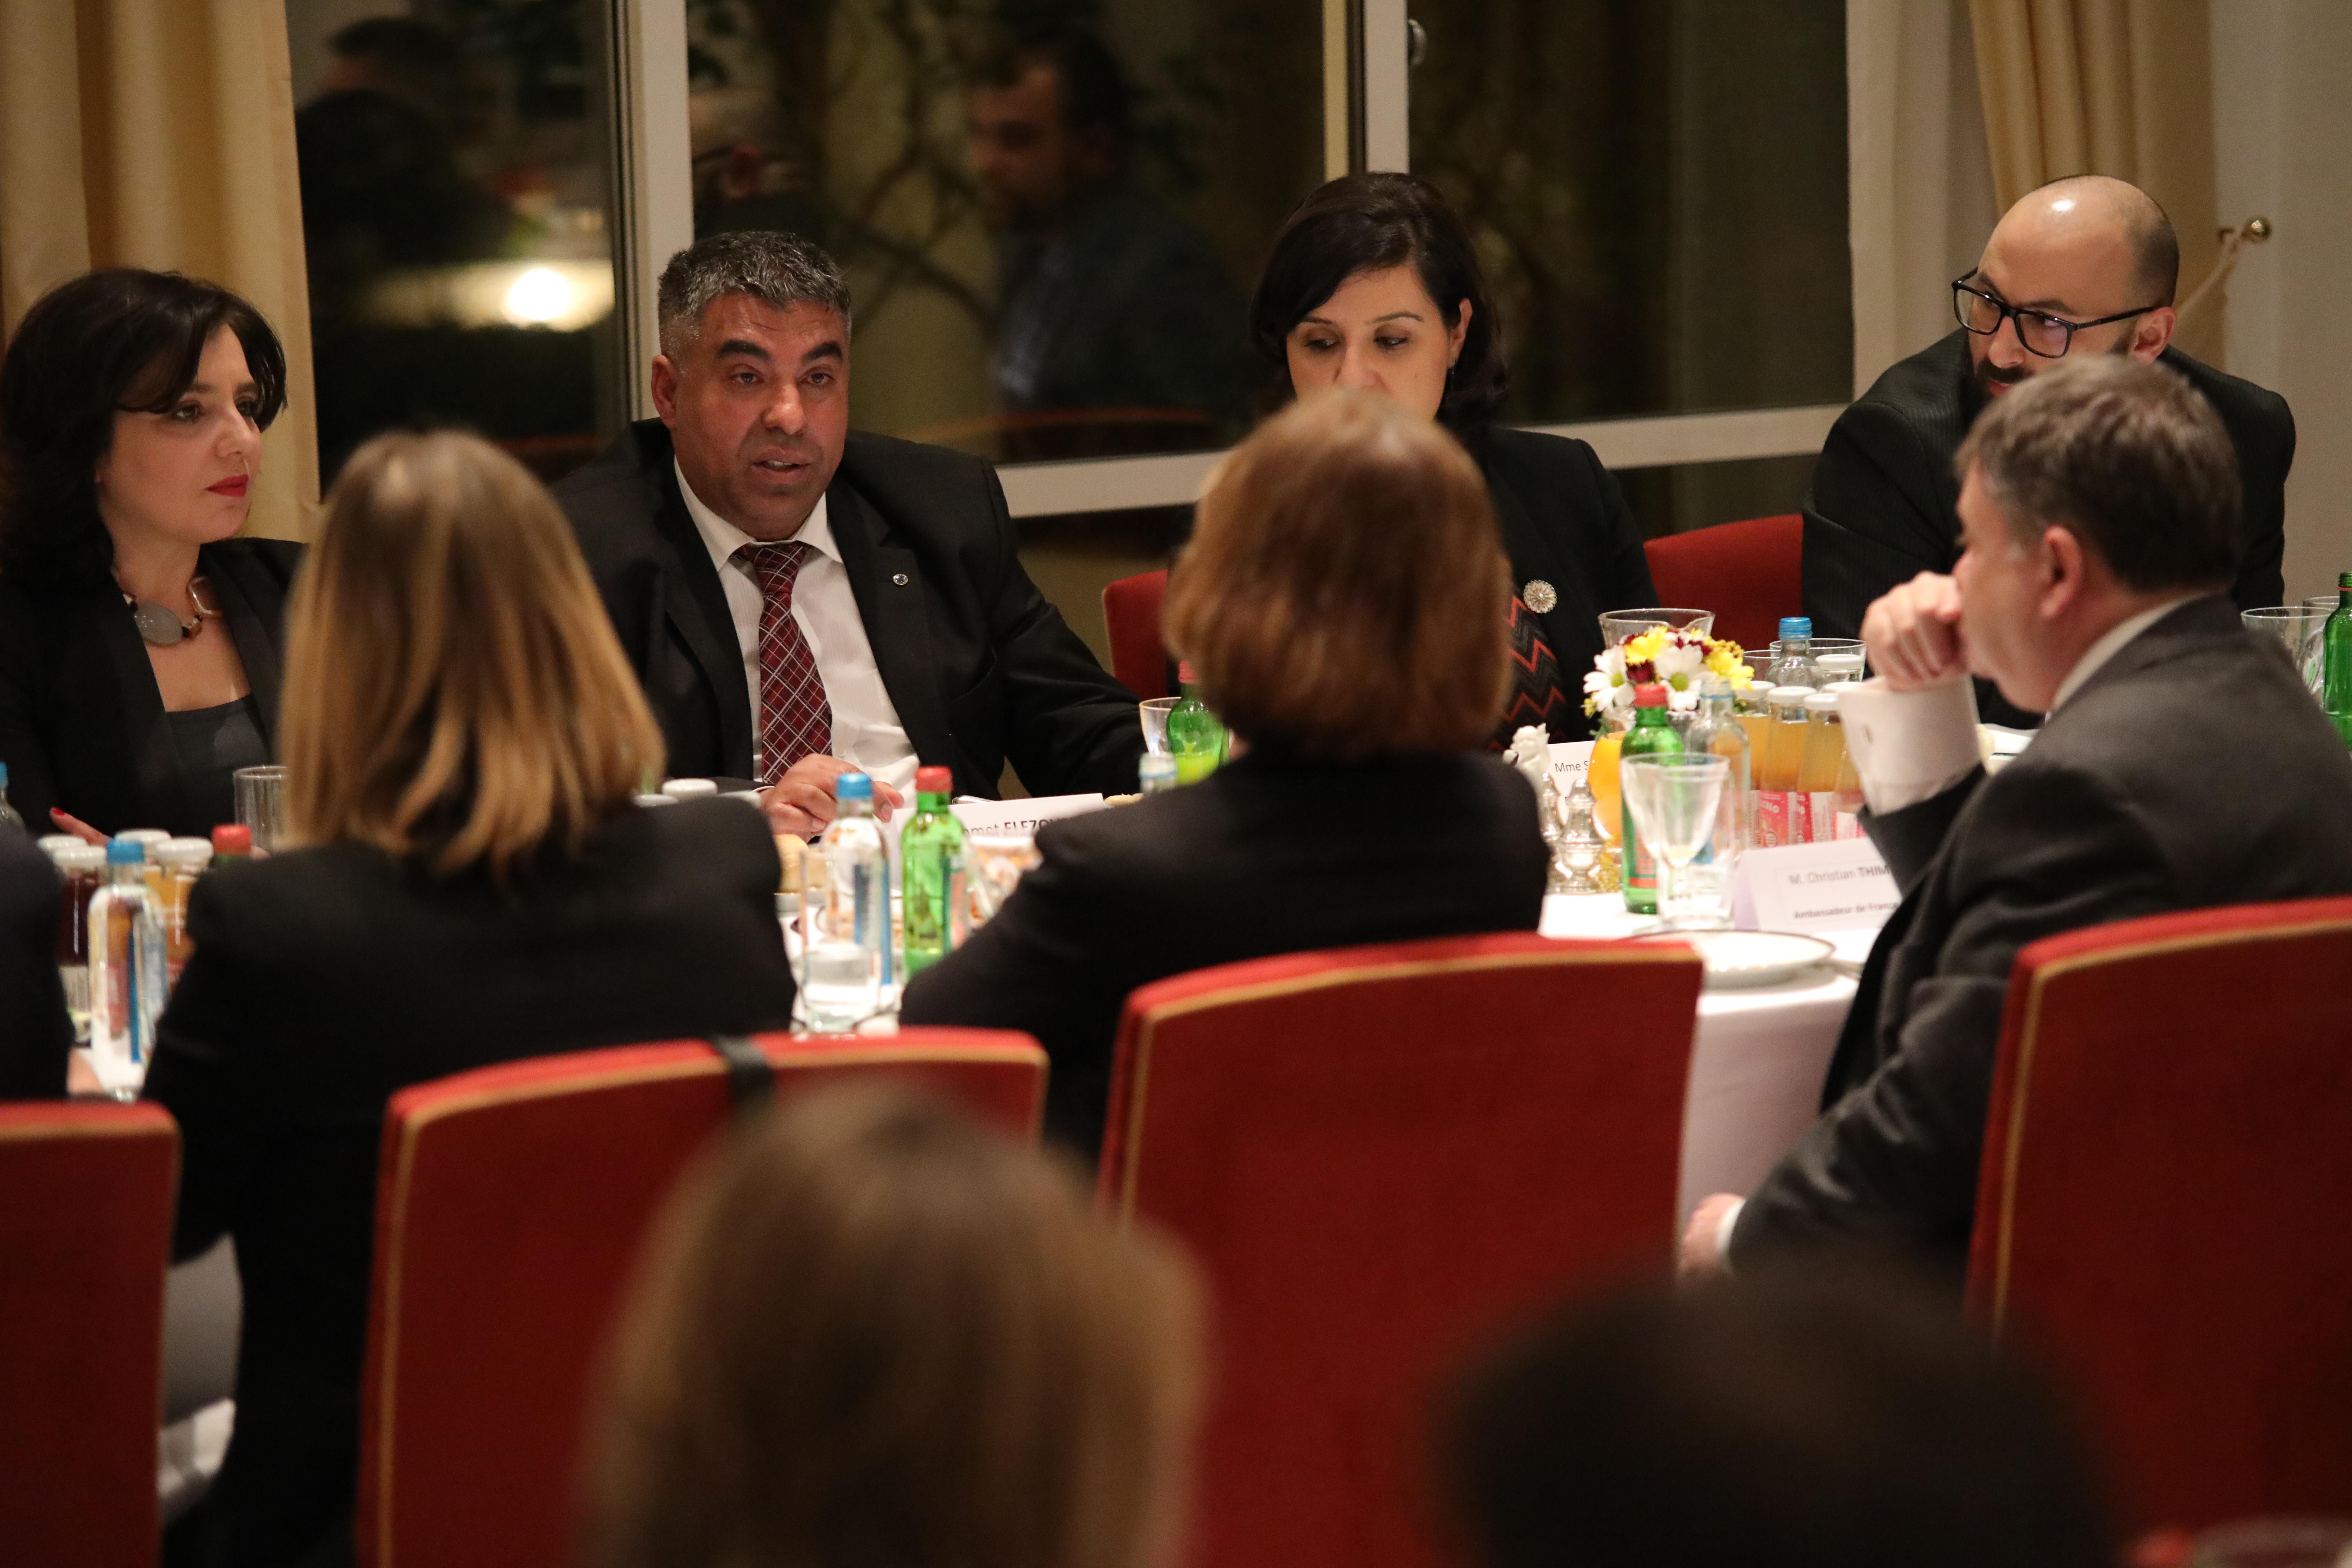 tek na razgovori Ashmet u ime na NRC s minister za evropski prasanja od franciju